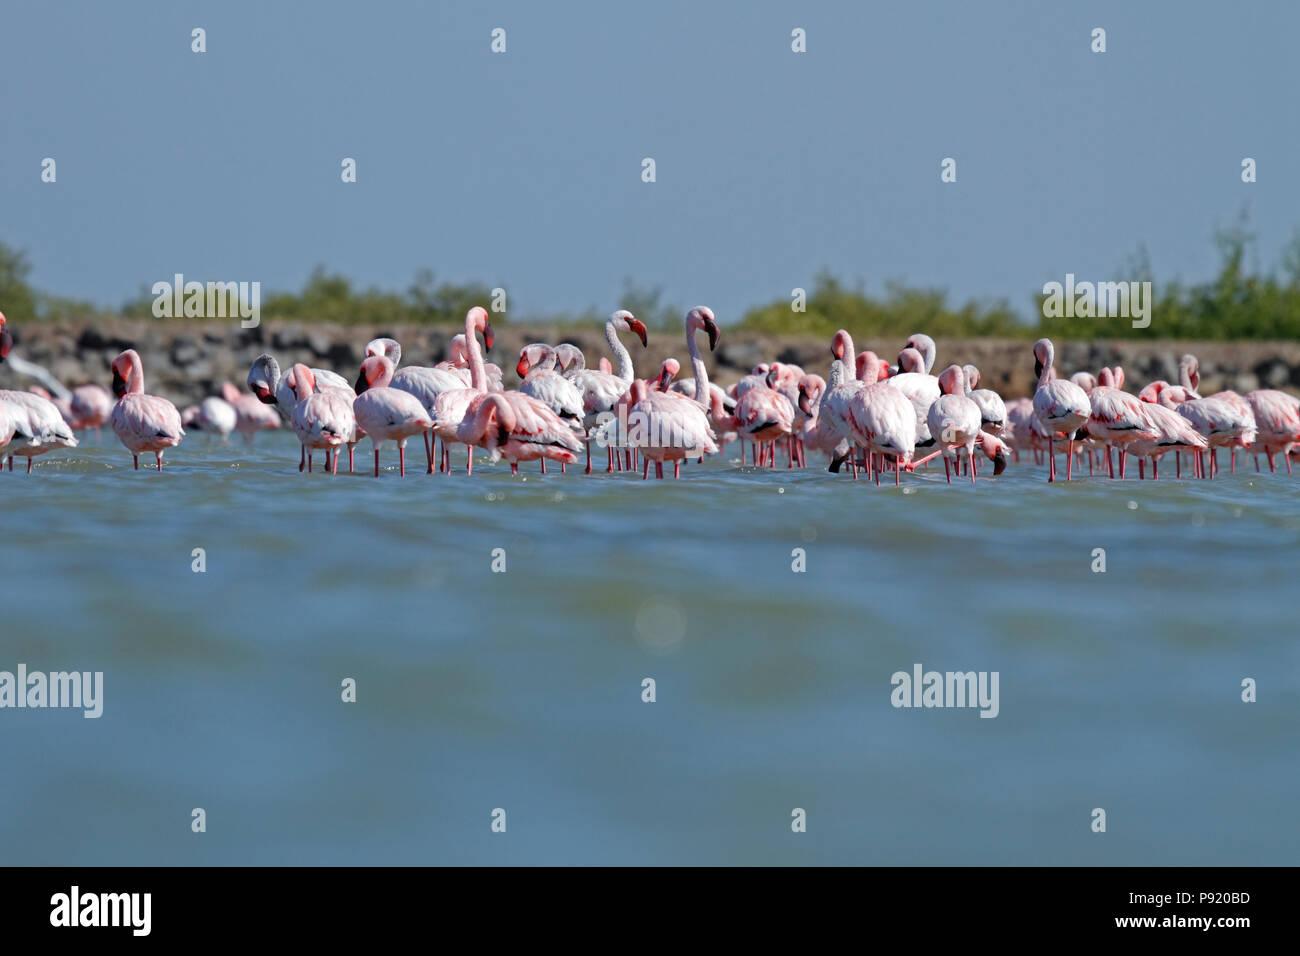 Flamingos near Jamnagar in Gujarat, India - Stock Image